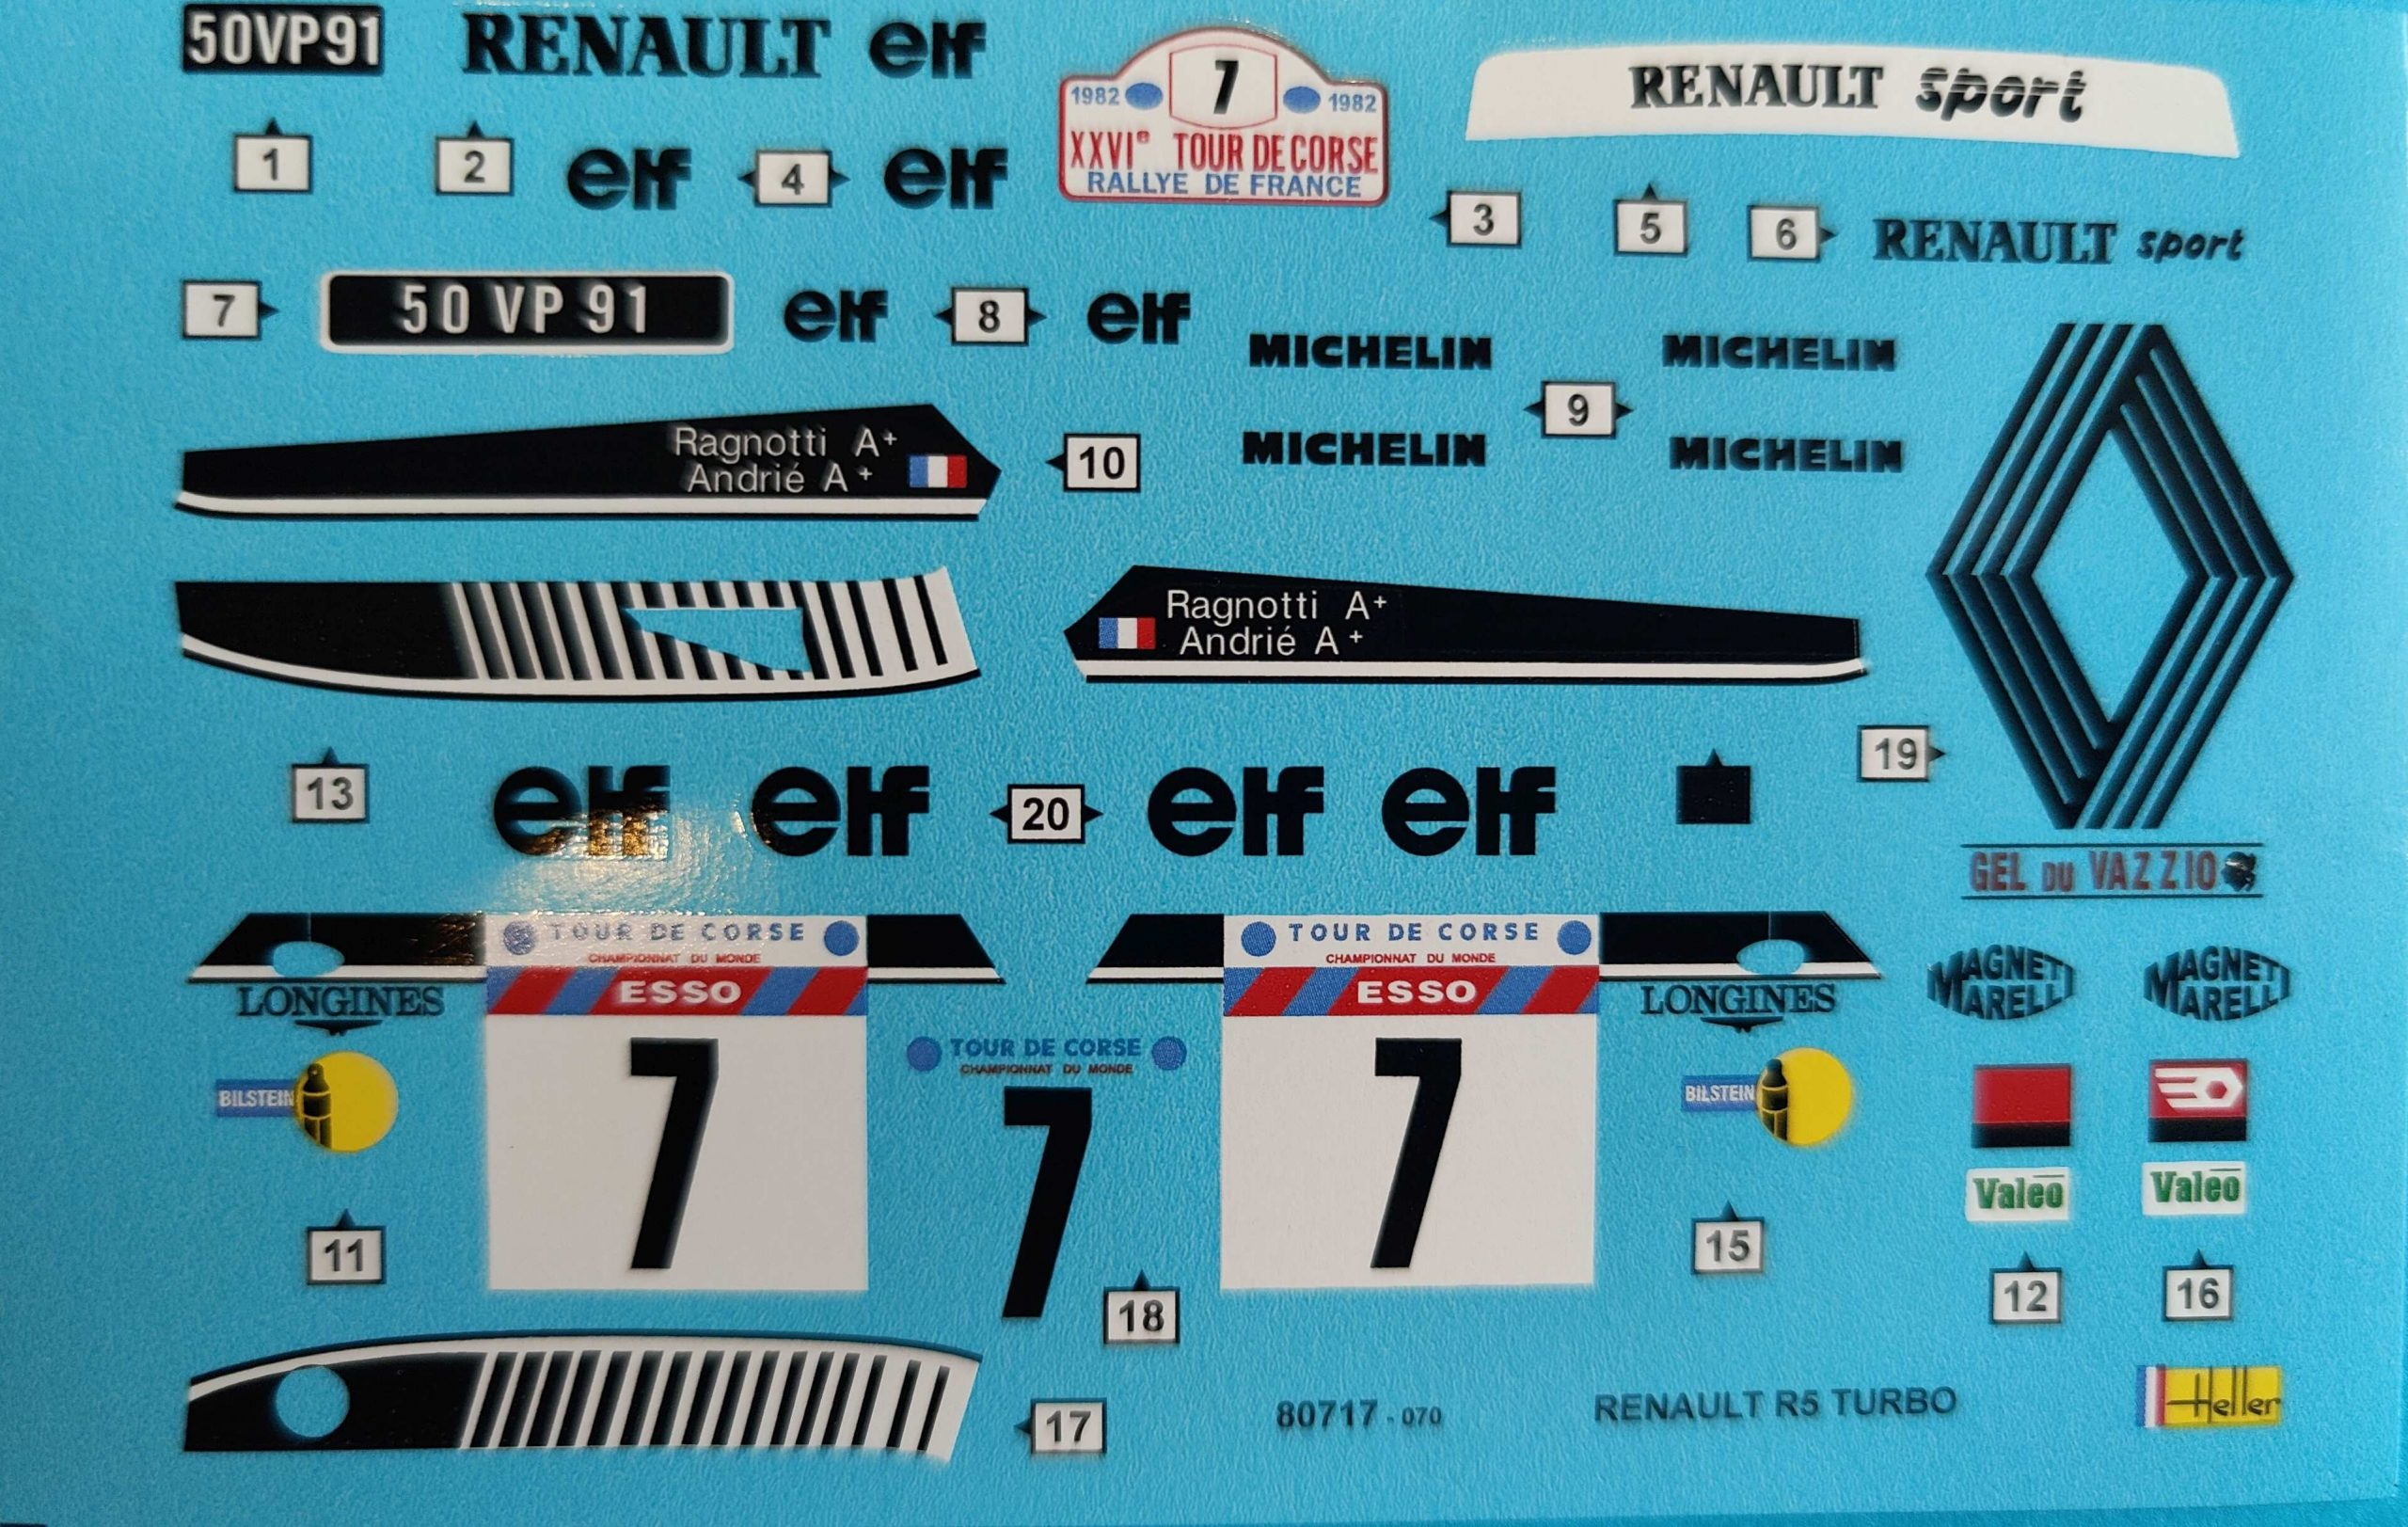 HellerR5Turbo014-scaled Renault R5 Turbo in 1:24 von Heller #80717